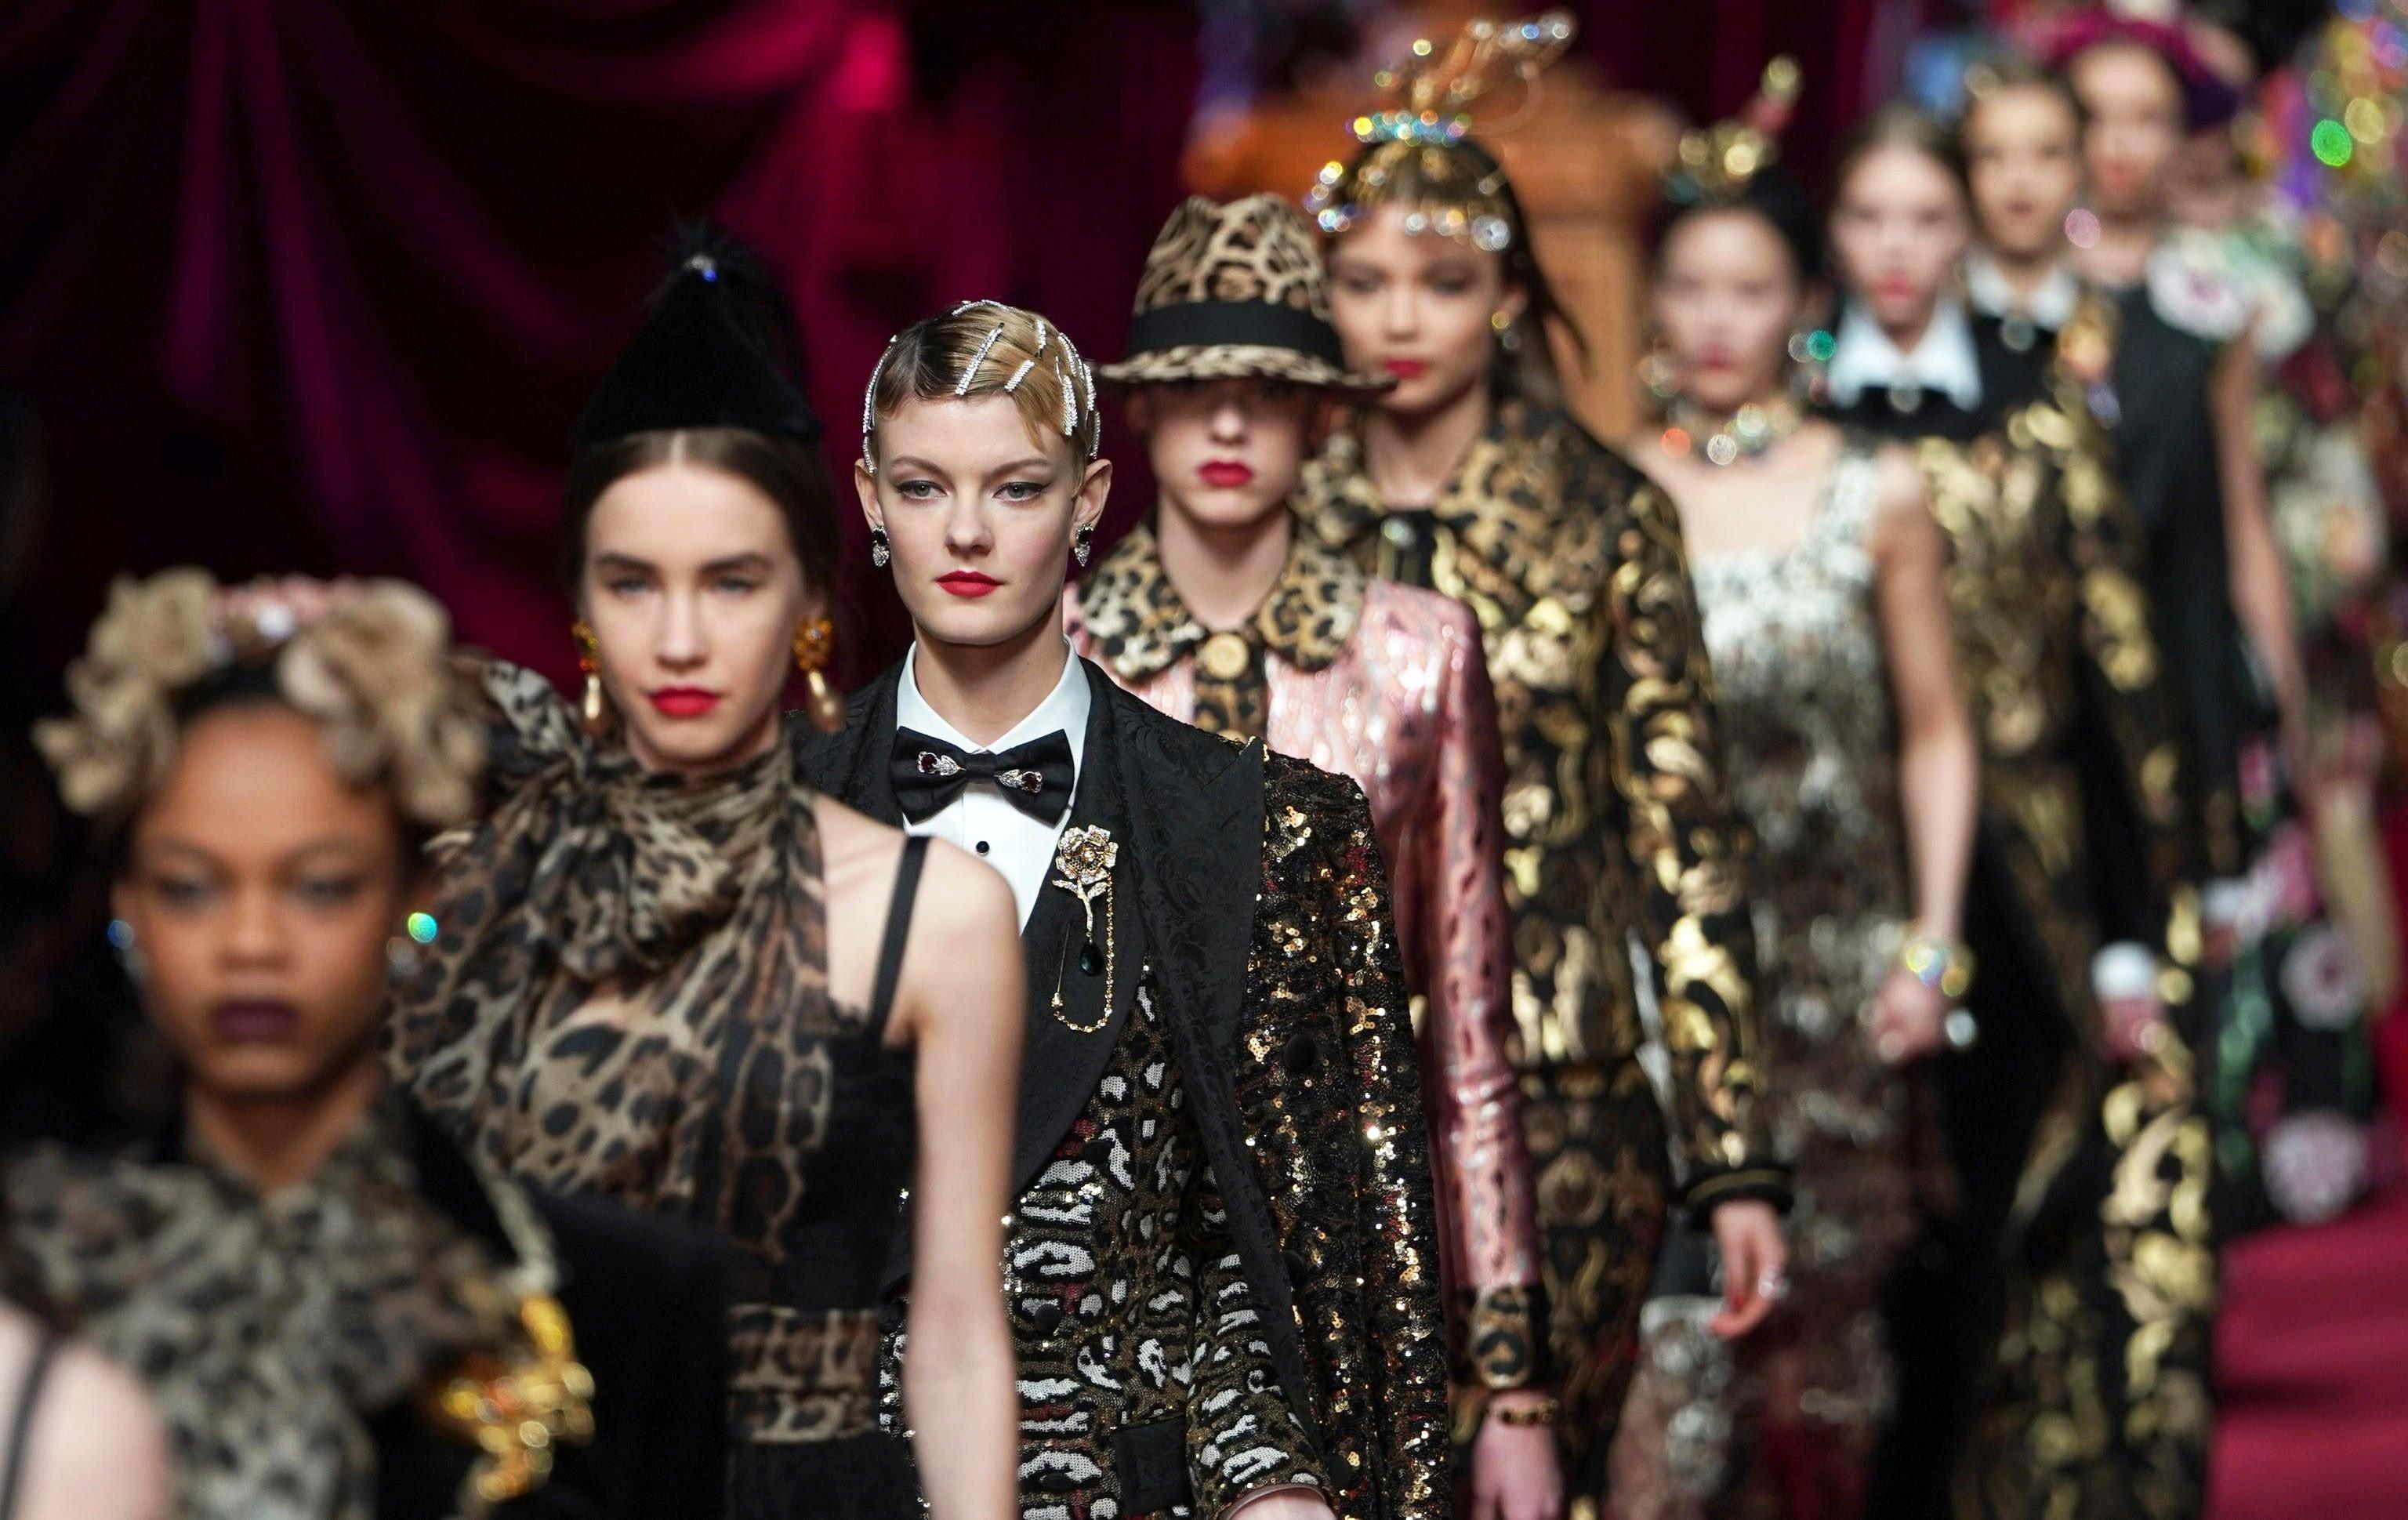 119b53001692 Milan Fashion Week: Fendi says tearful goodbye to Karl Lagerfeld while  Bottega Veneta's Daniel Lee makes a terrific debut